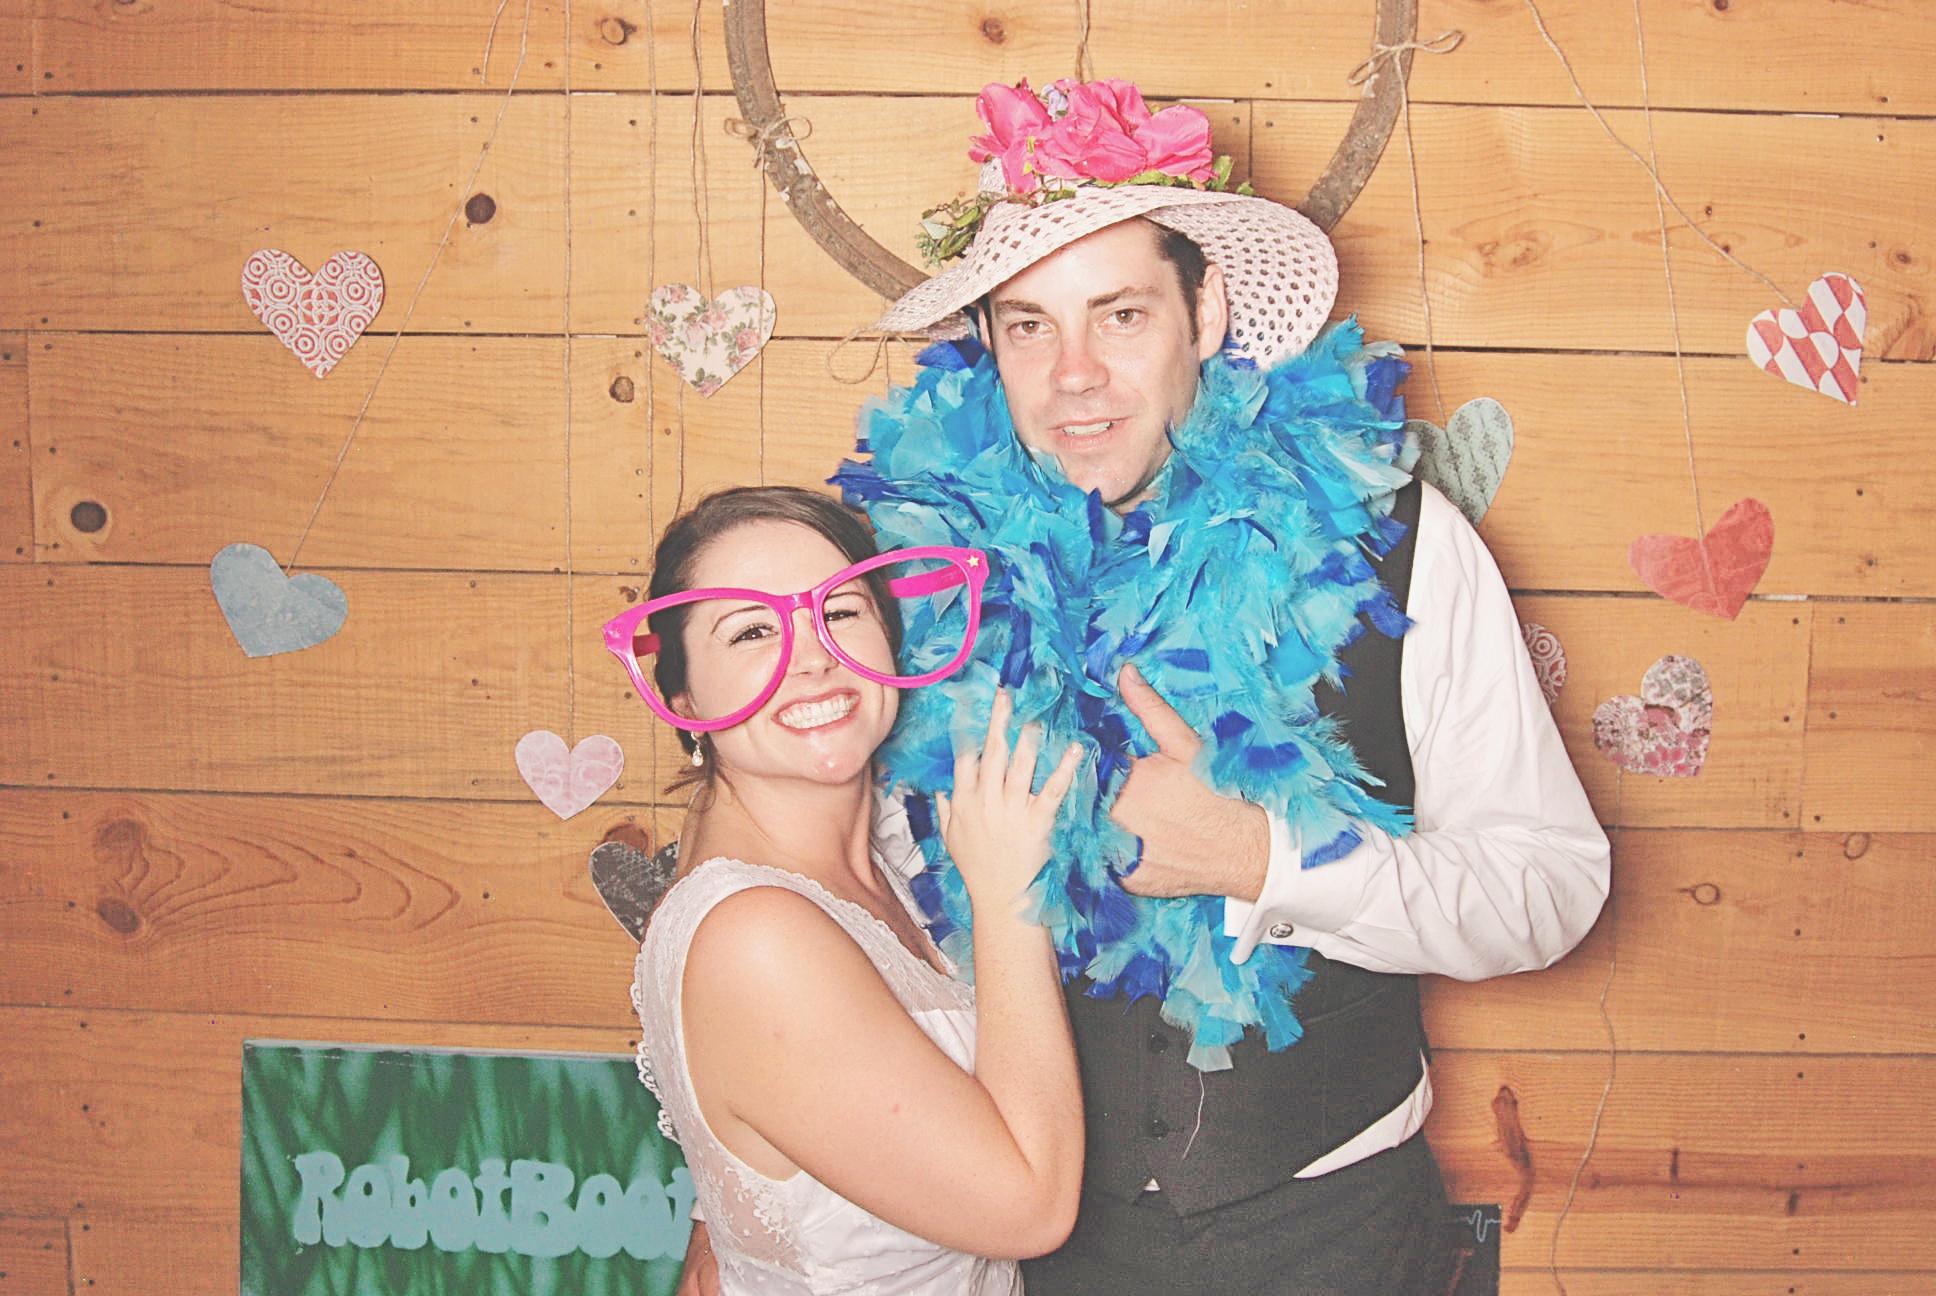 6-20-15 RC Atlanta Mountain Laurel Farm PhotoBooth - Ashley & Derek's Wedding - RobotBooth20150621_641